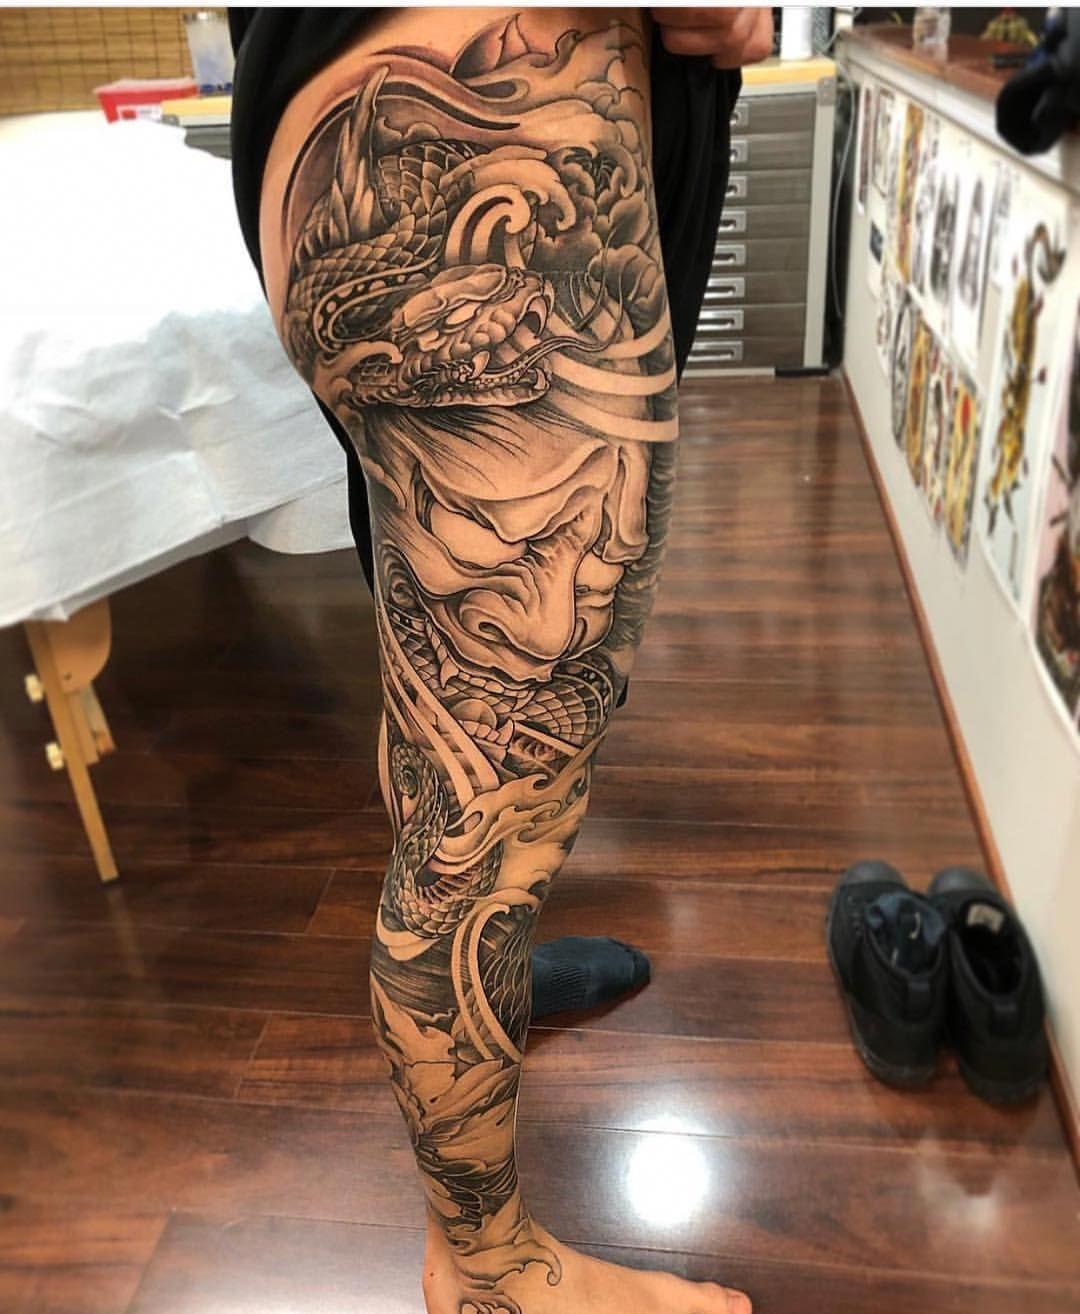 Bayarea Tattoo 9dragonsink On Instagram Snake Hannya Leg Sleeve By Nhaomkaratattoo Sleevetattoo Thigh Tattoo Men Full Leg Tattoos Leg Tattoo Men